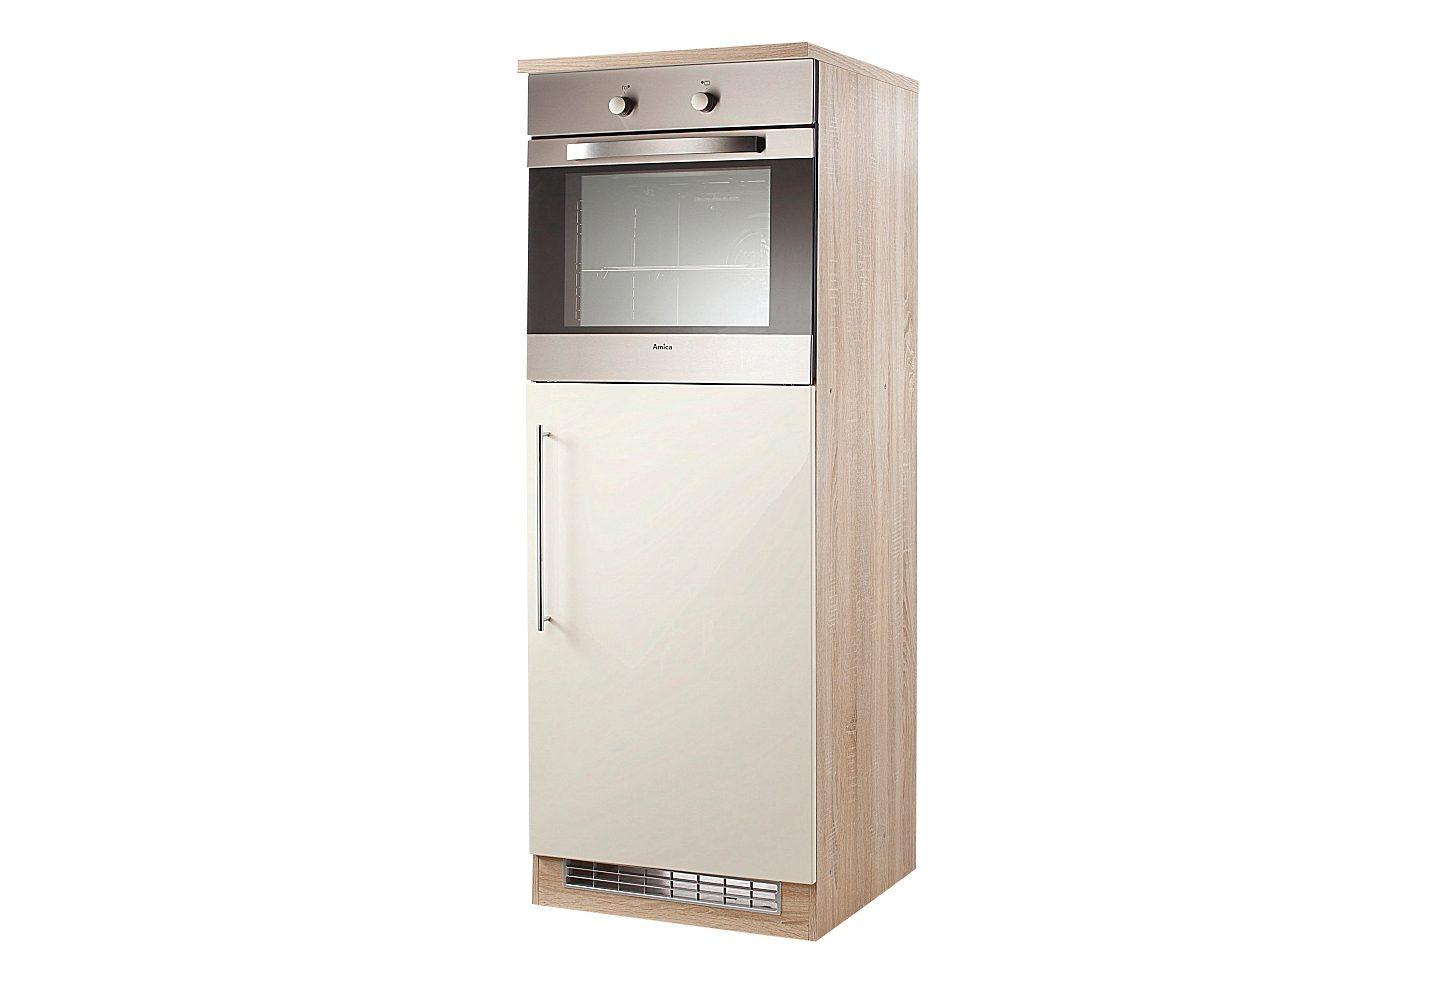 Aufbau Kühlschrank Bild : Viva kühlschrank schön gardenlounge viva b spektakulärer aufbau